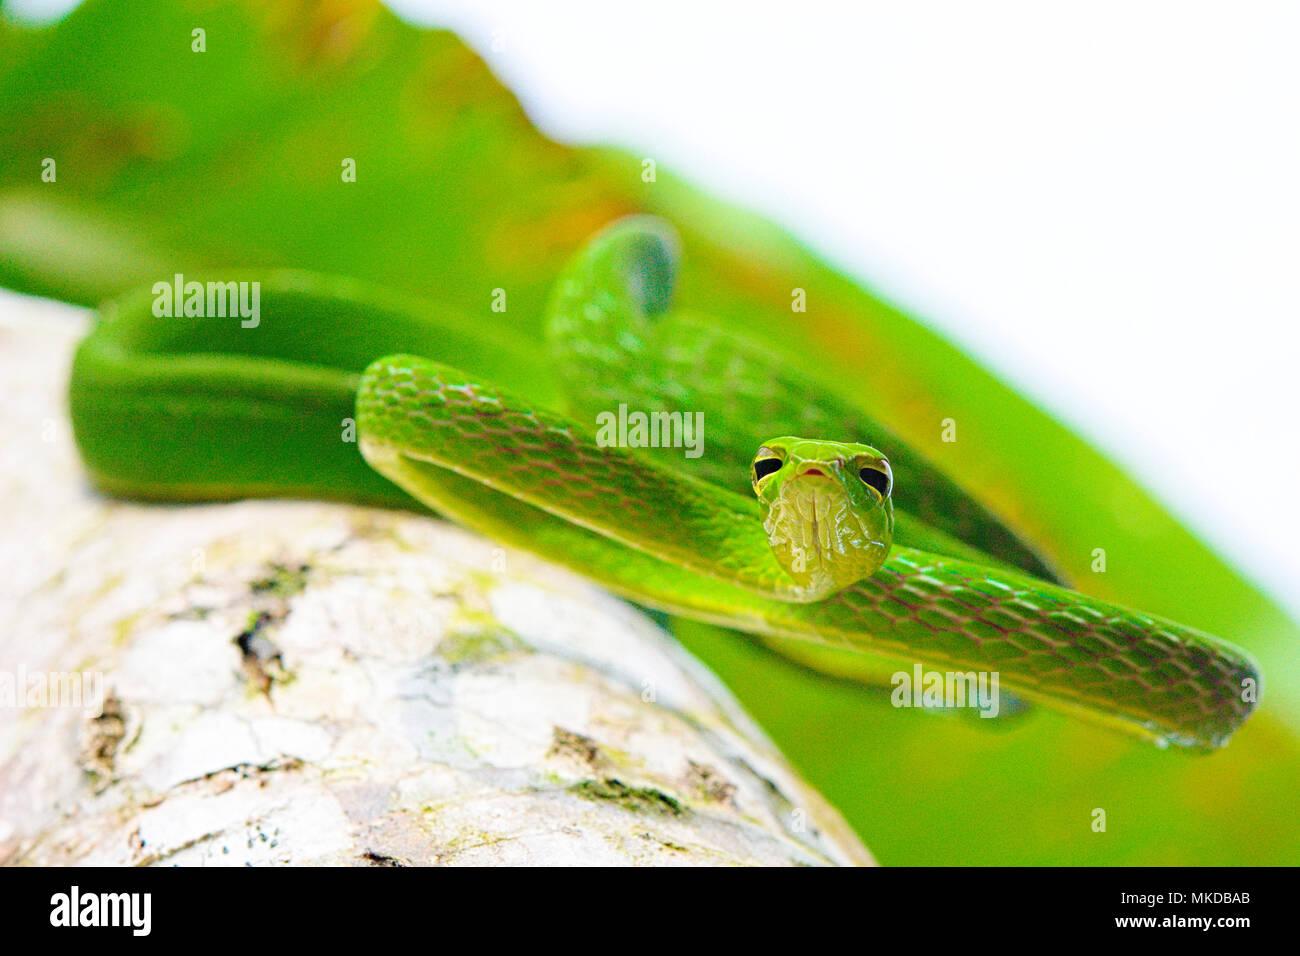 Serpent de vigne (Ahaetulla prasina) de Tomohon Sulawesi du Nord. Banque D'Images